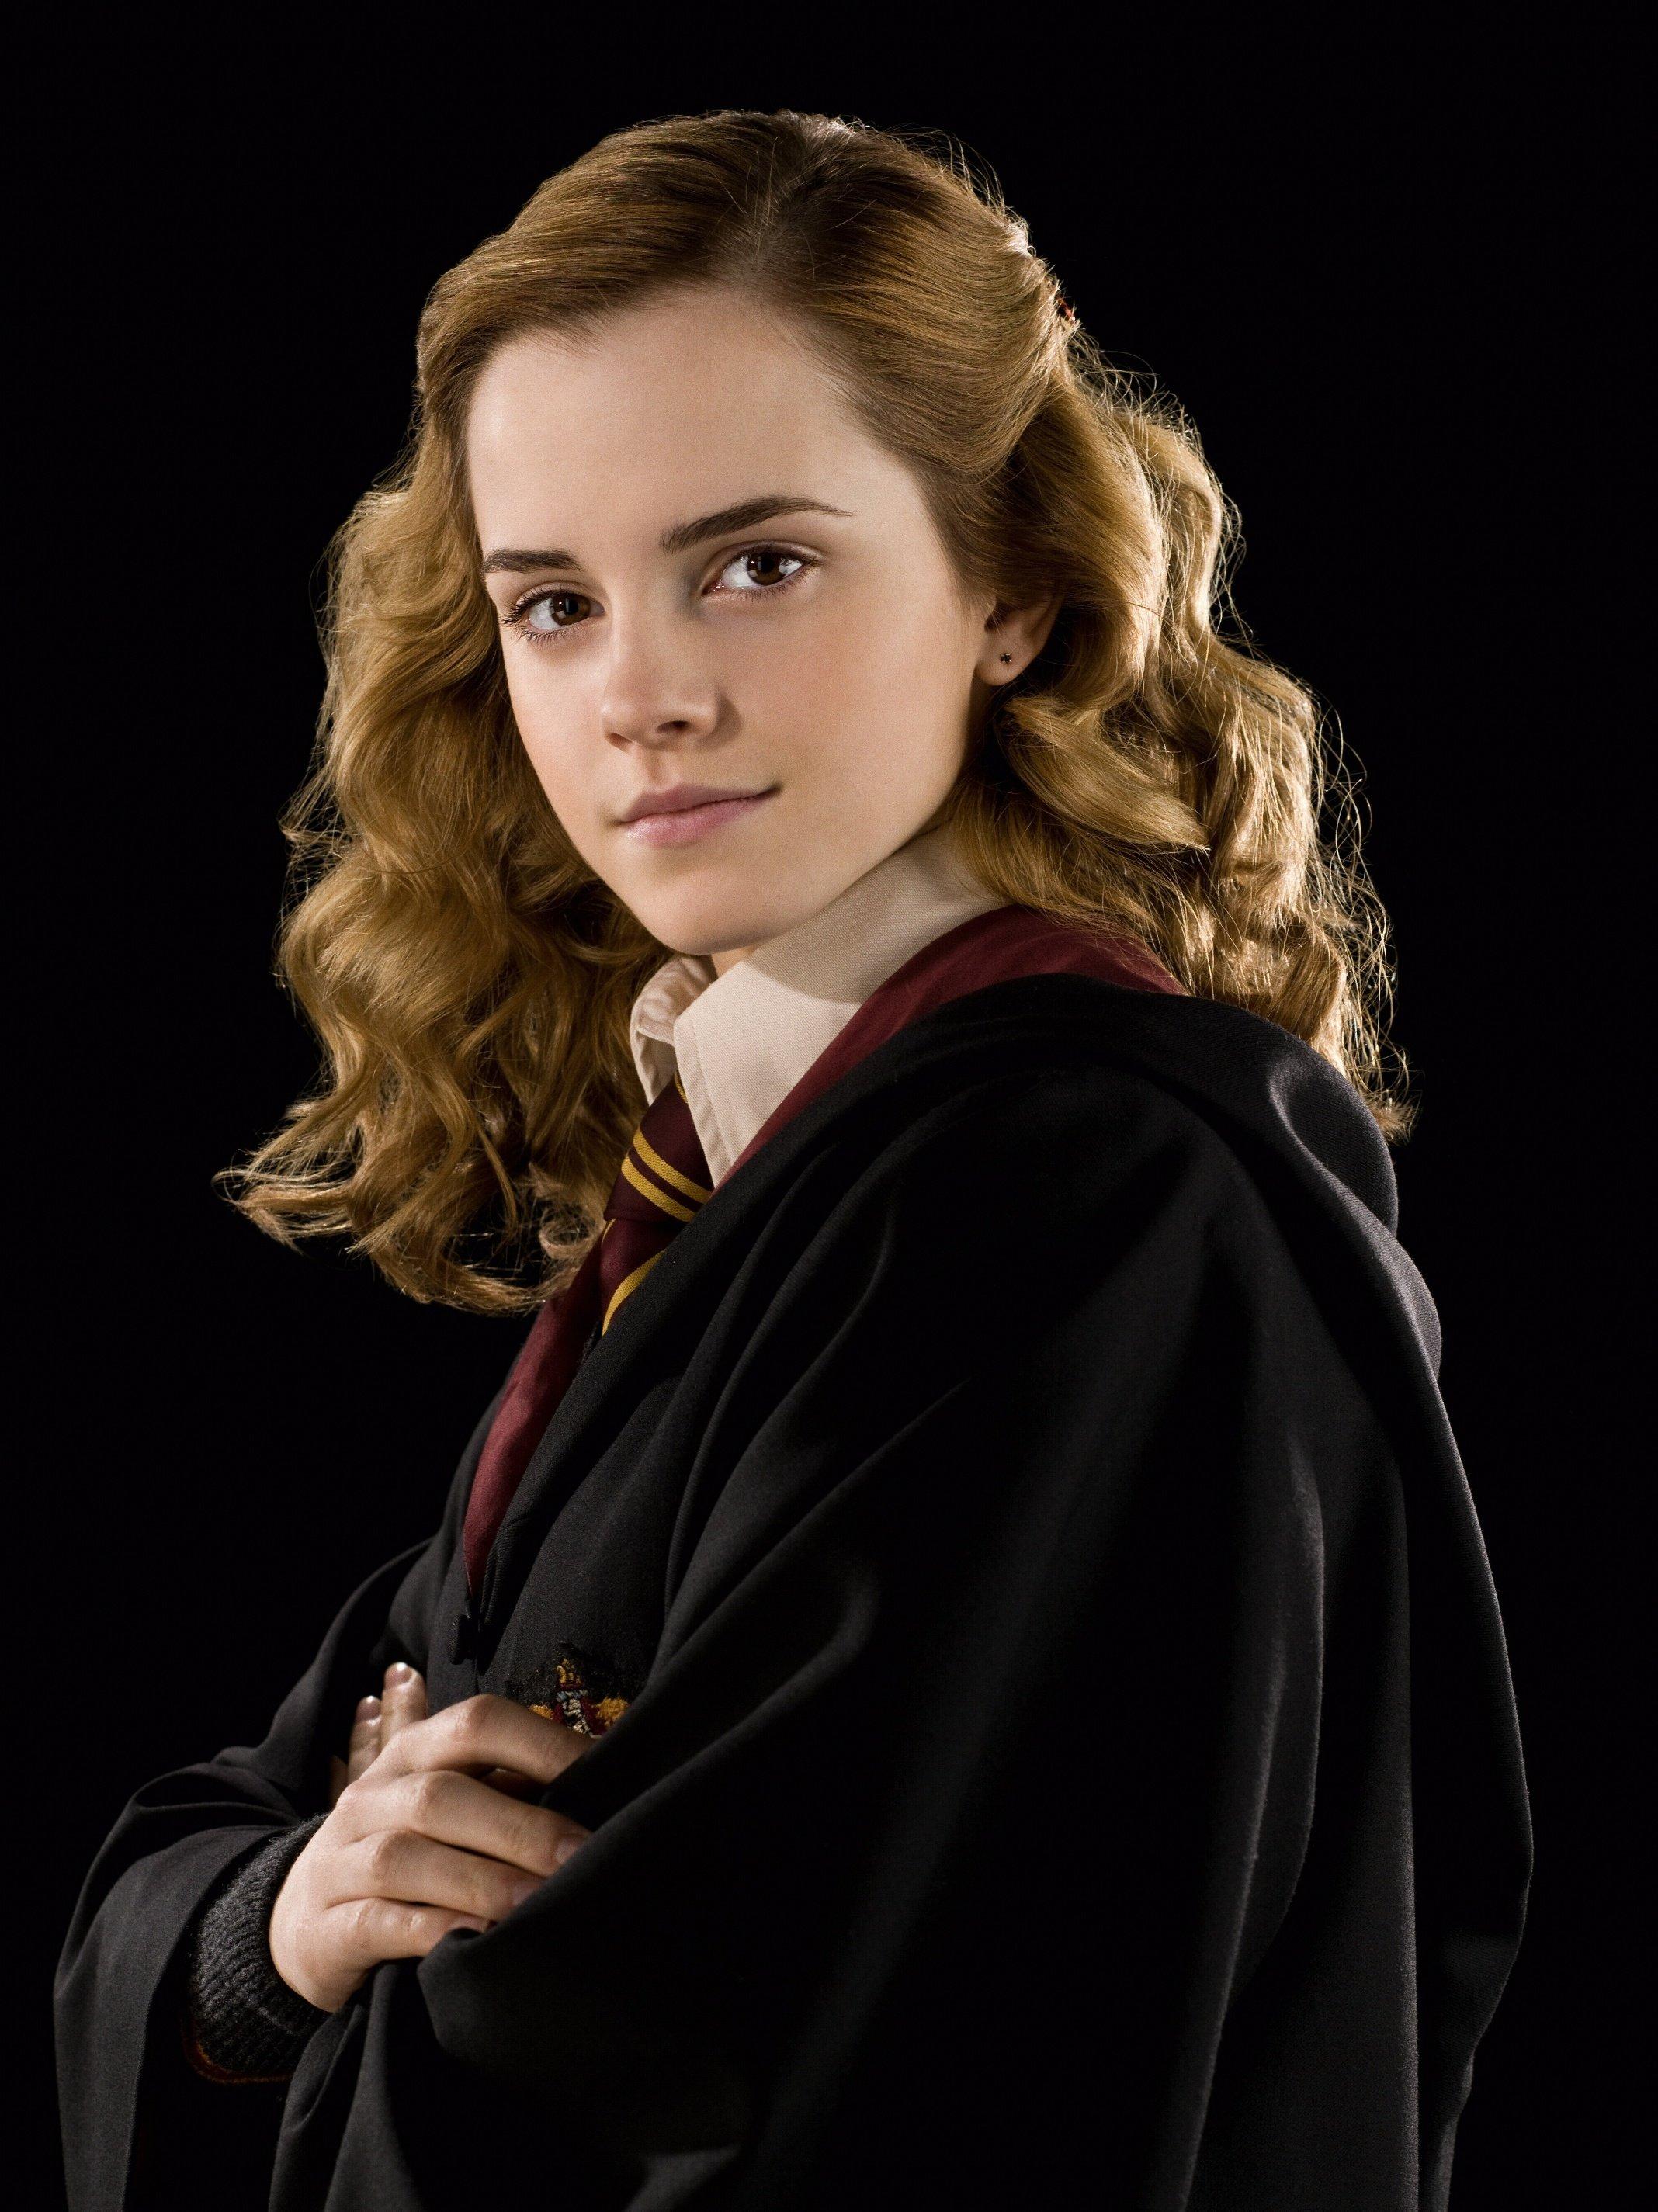 Hermione granger hbp promo 4 - Luna lovegood and hermione granger ...